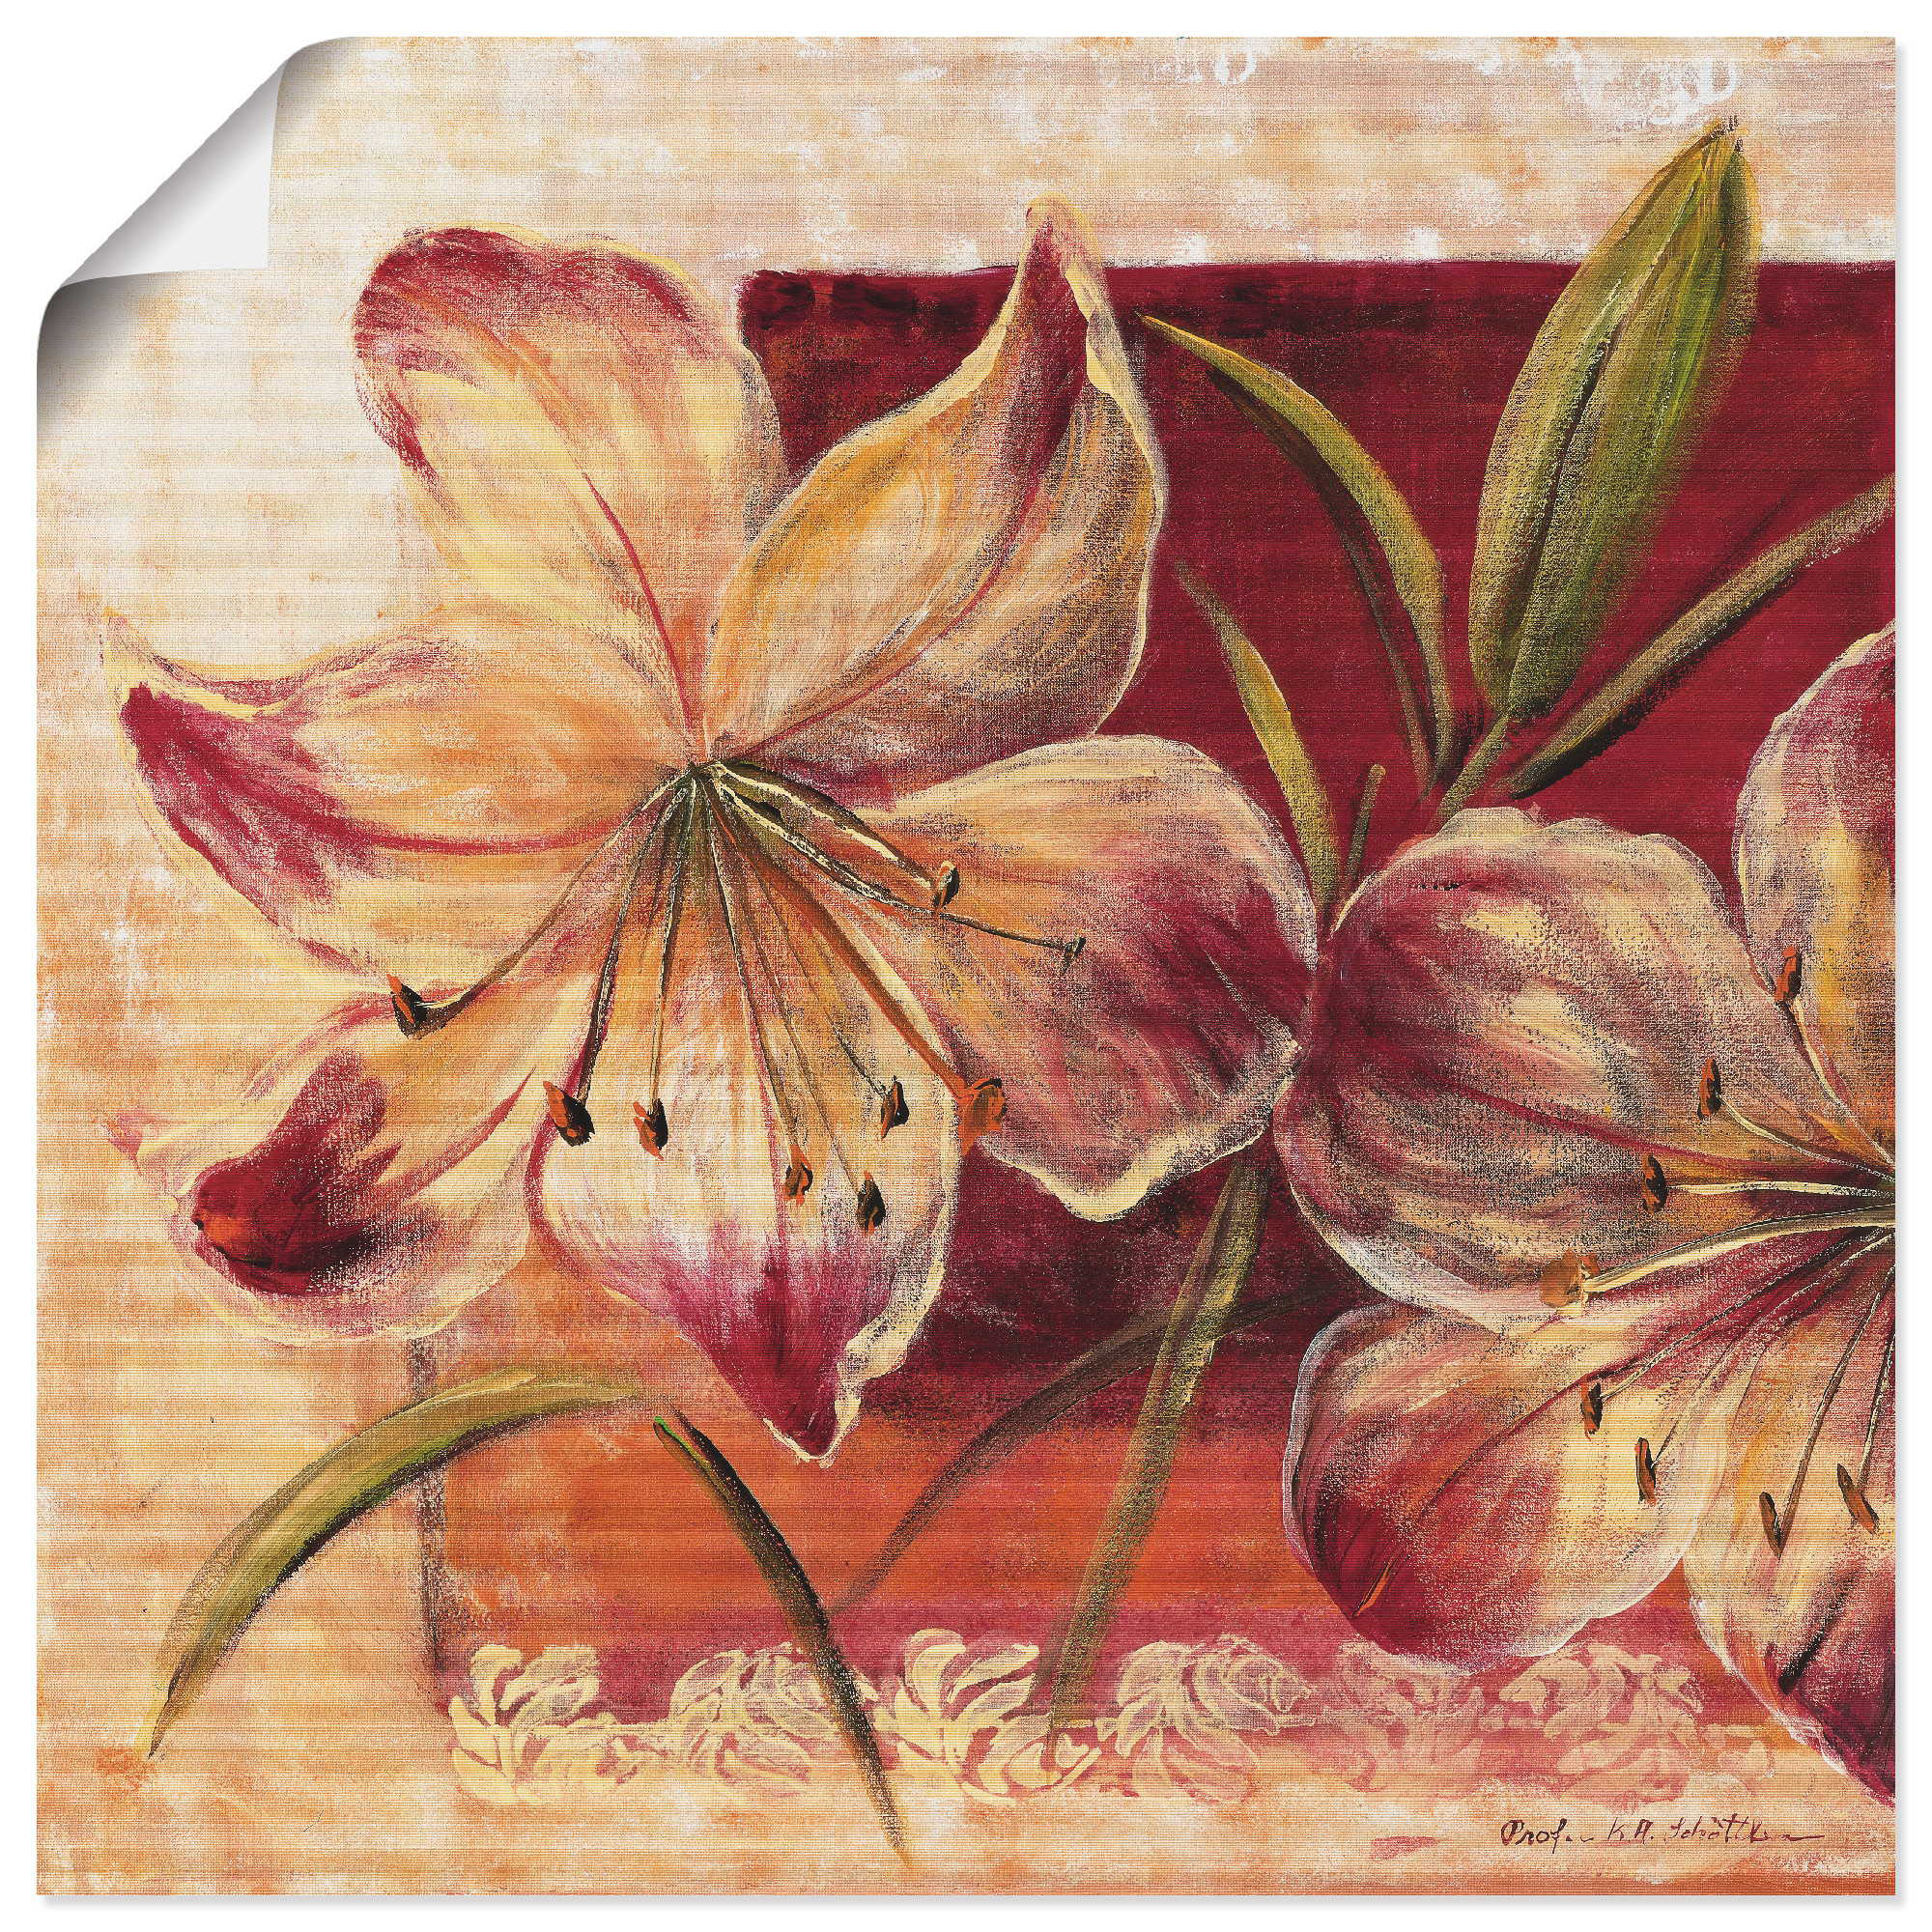 Artland Wandbild Klassische Blumen III, Blumen, (1 St.), in vielen Größen & Produktarten -Leinwandbild, Poster, Wandaufkleber / Wandtattoo auch für Badezimmer geeignet